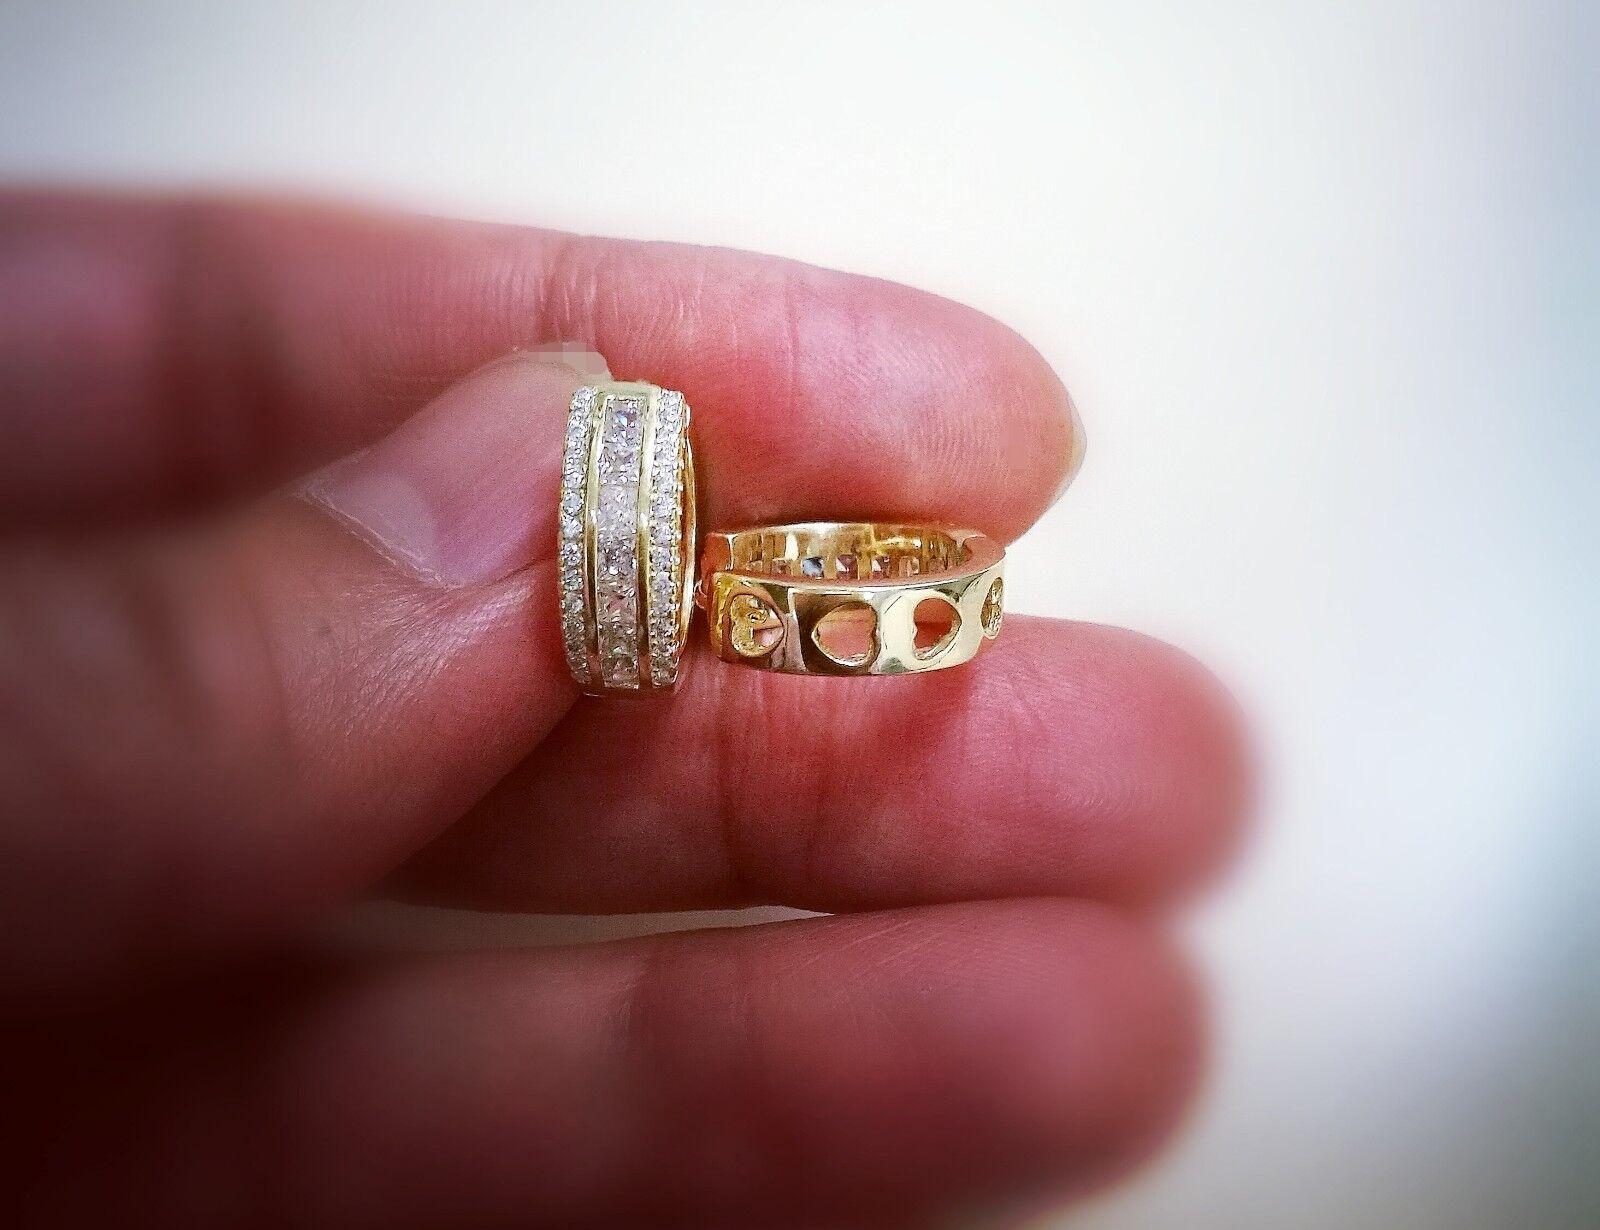 1 Ct Diamond Hoop Earrings Women Hoop Earrings 14K White Yellow Gold over 6